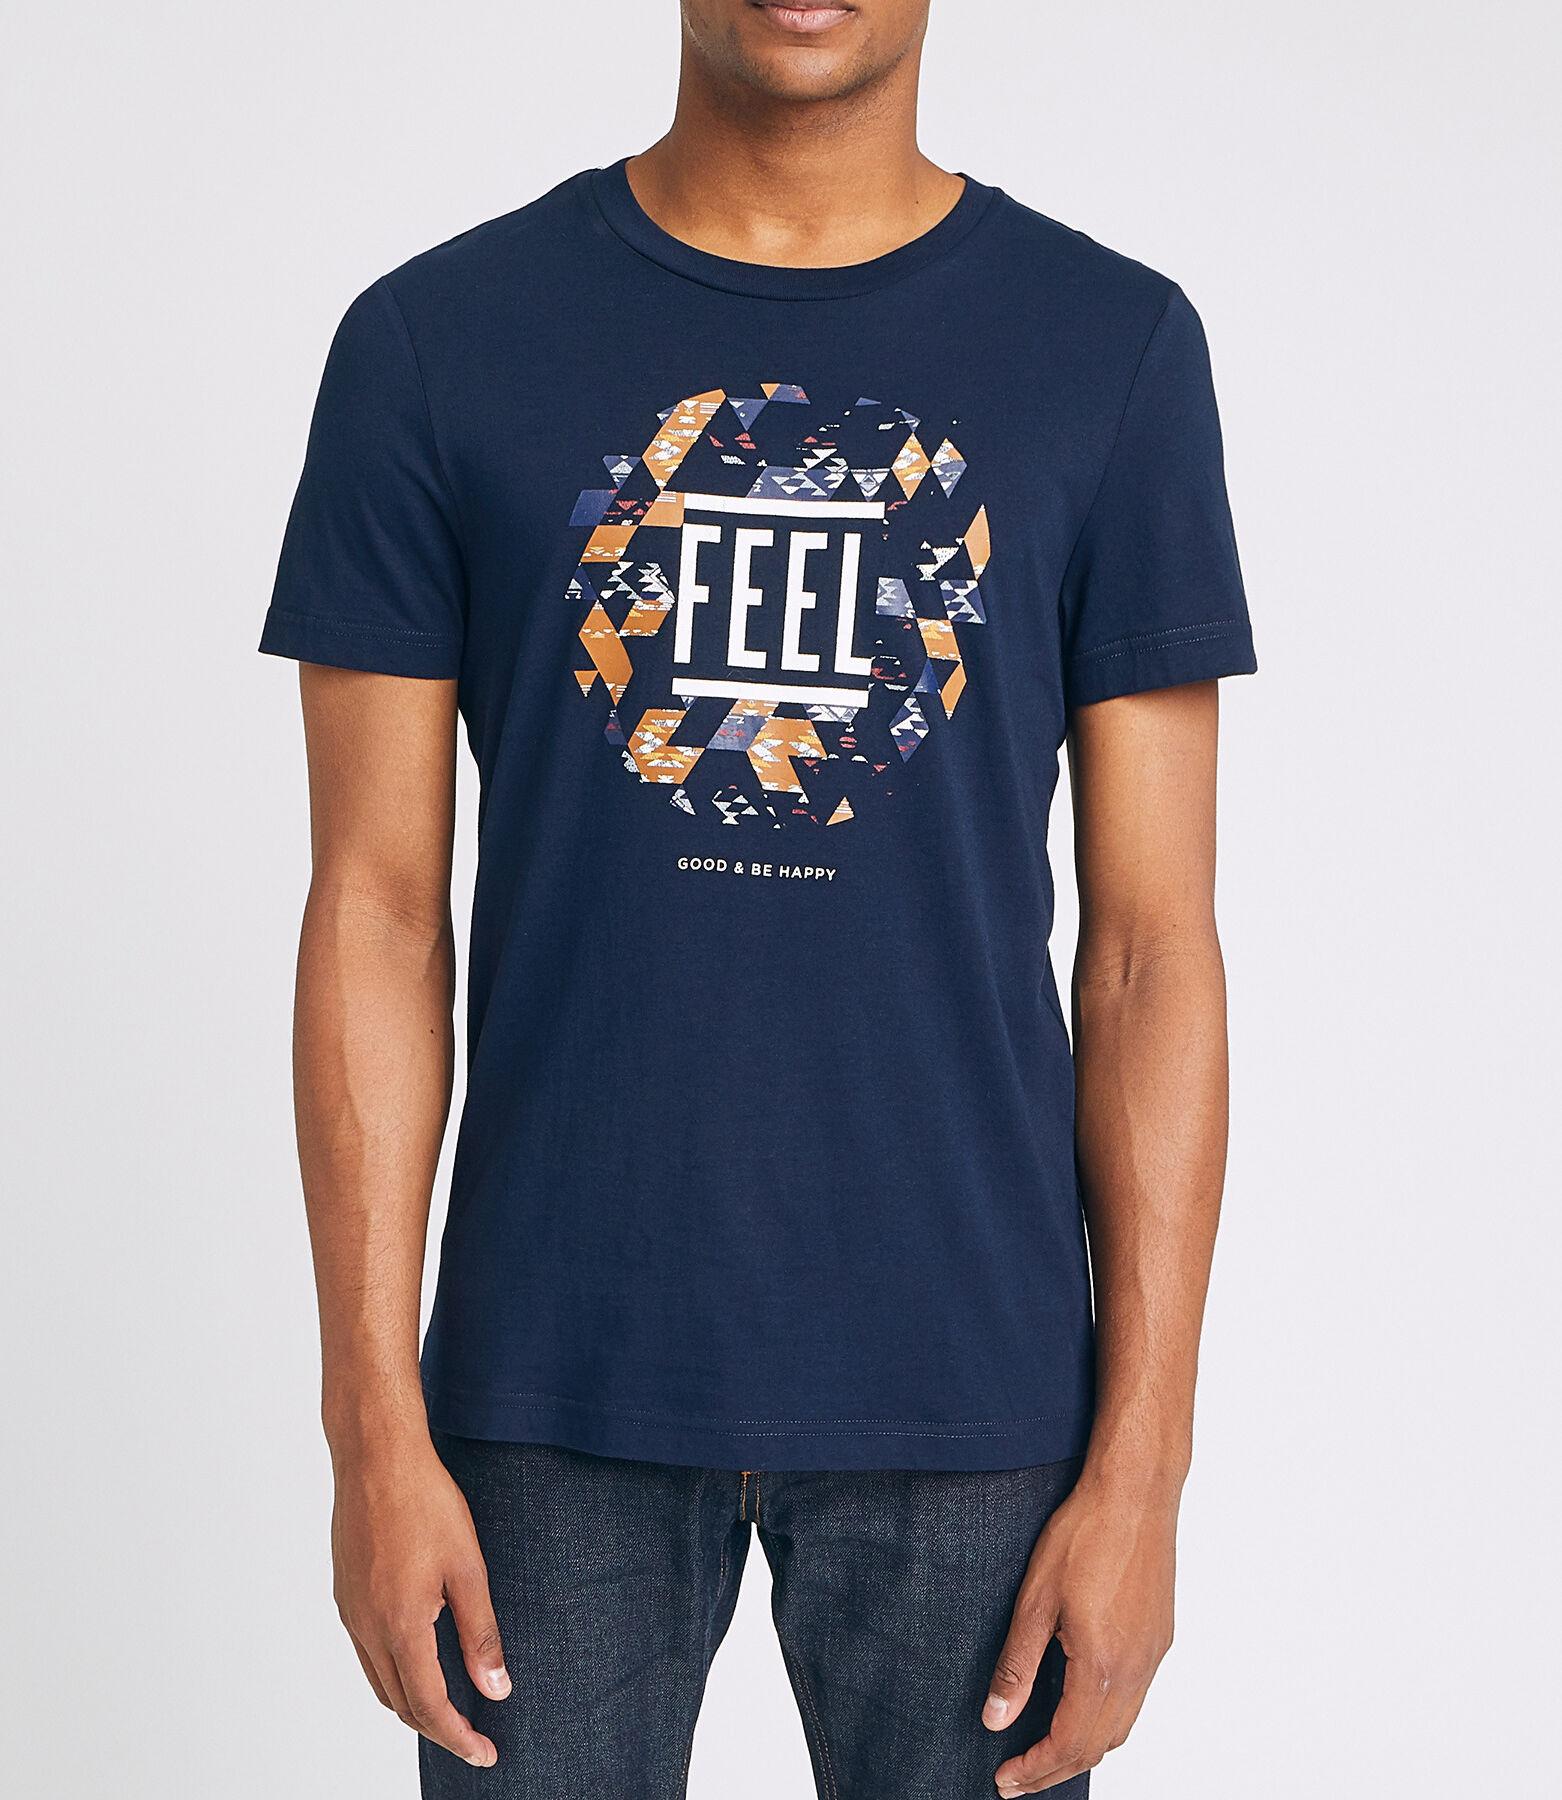 T-shirt FEEL GOOD & BE HAPPY